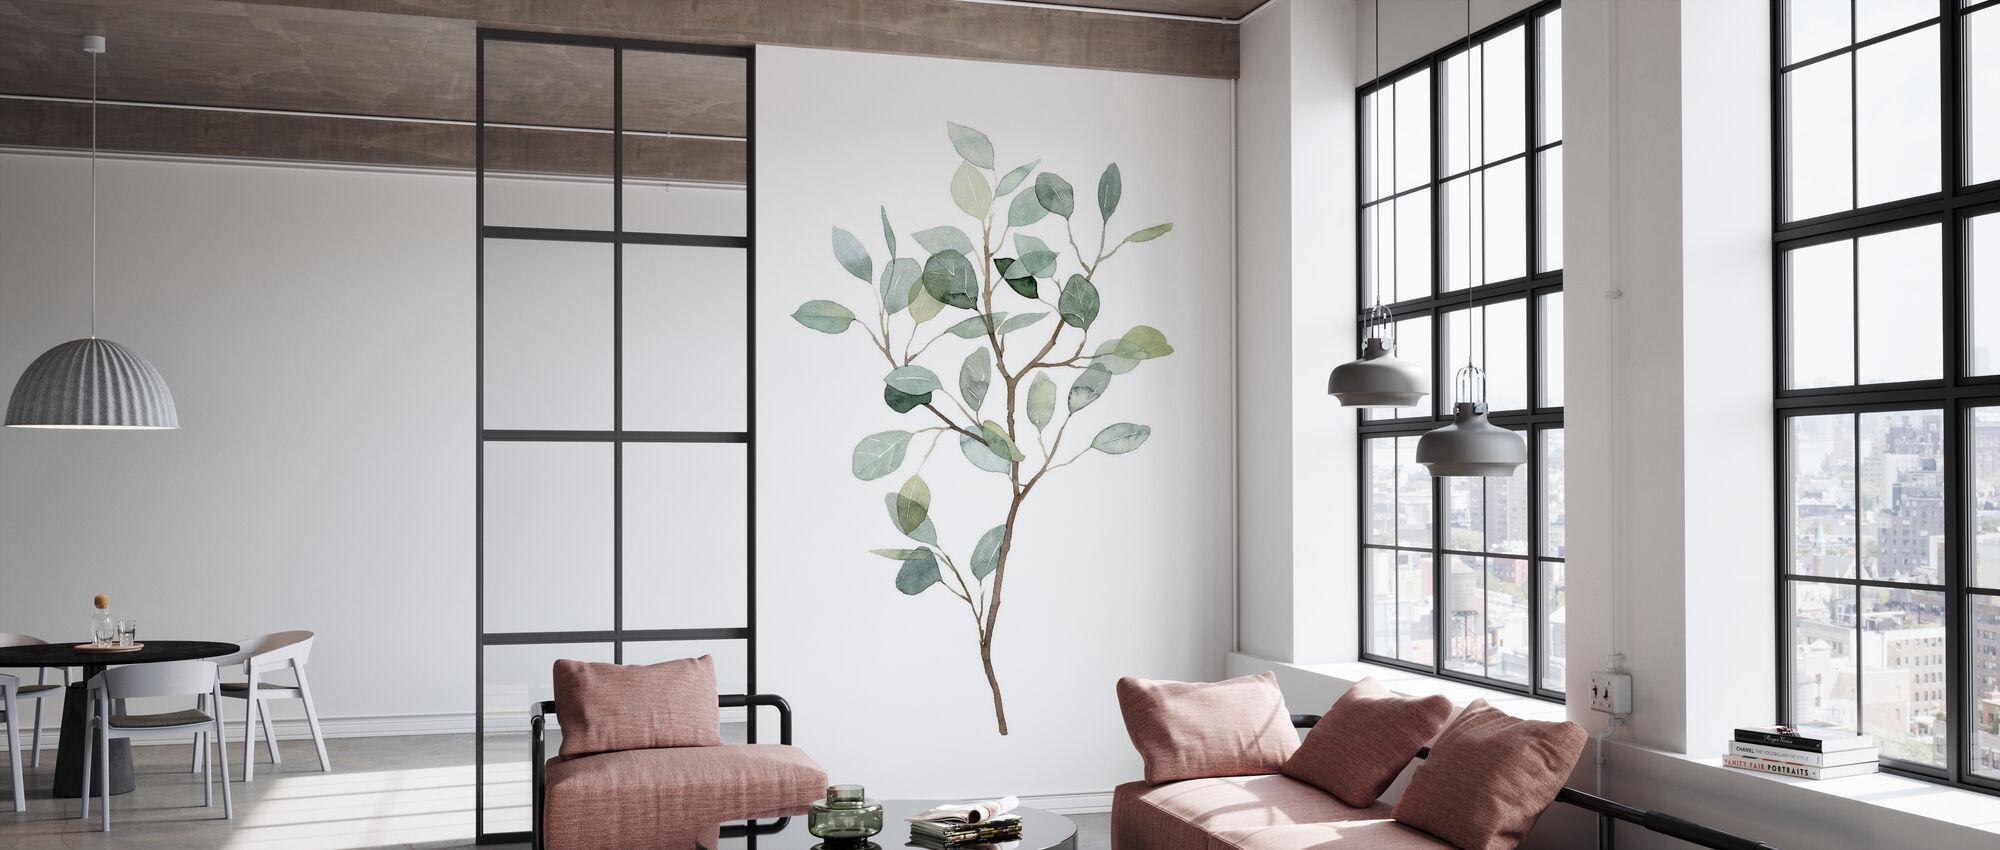 Seaglass Eukalyptus - Tapete - Büro